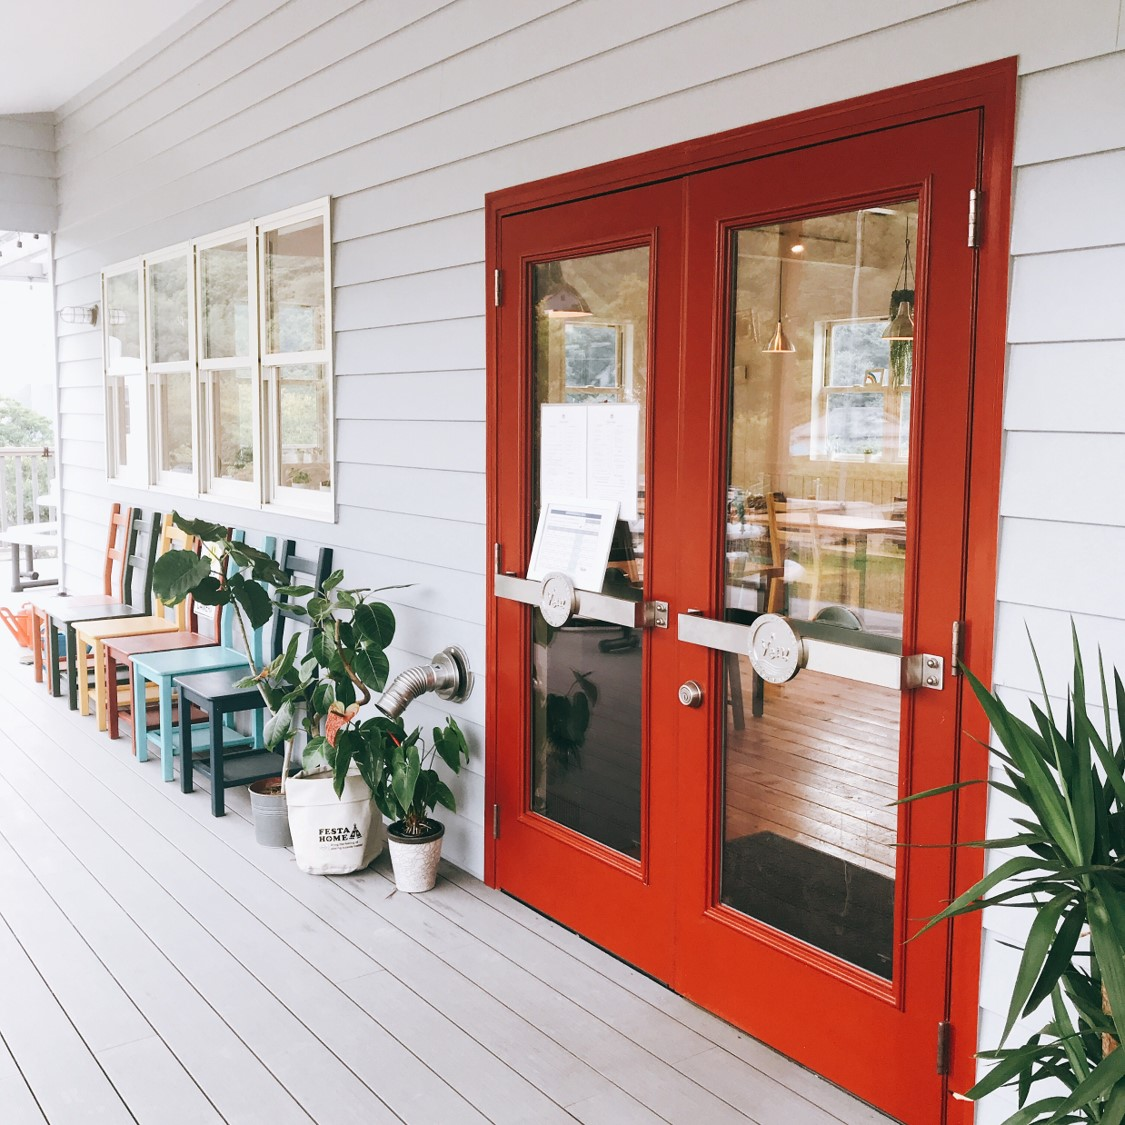 Ven店頭の写真。赤いドアの横に置かれたカラフルな椅子が特徴。